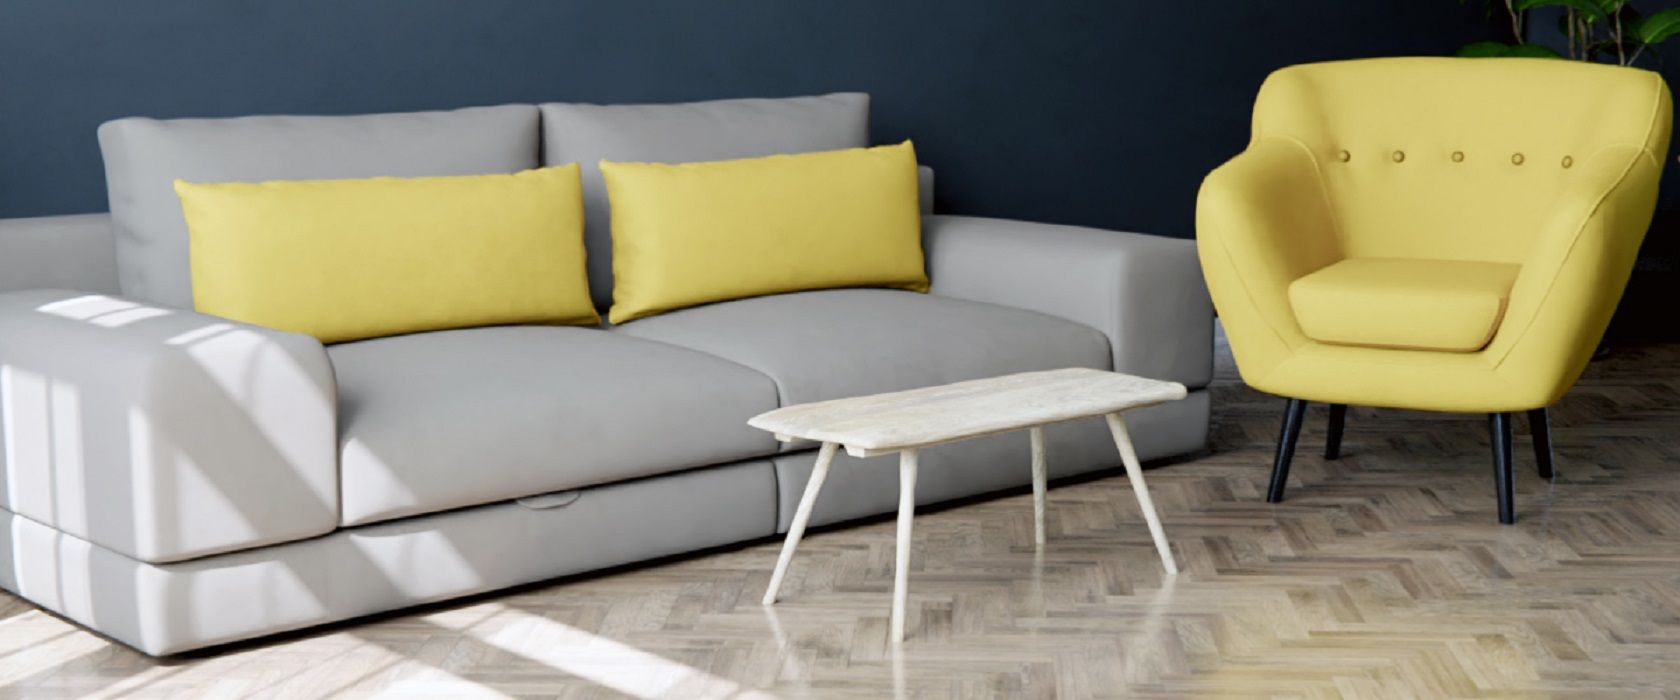 Тримісний диван Dario - Фото 2 - Pufetto